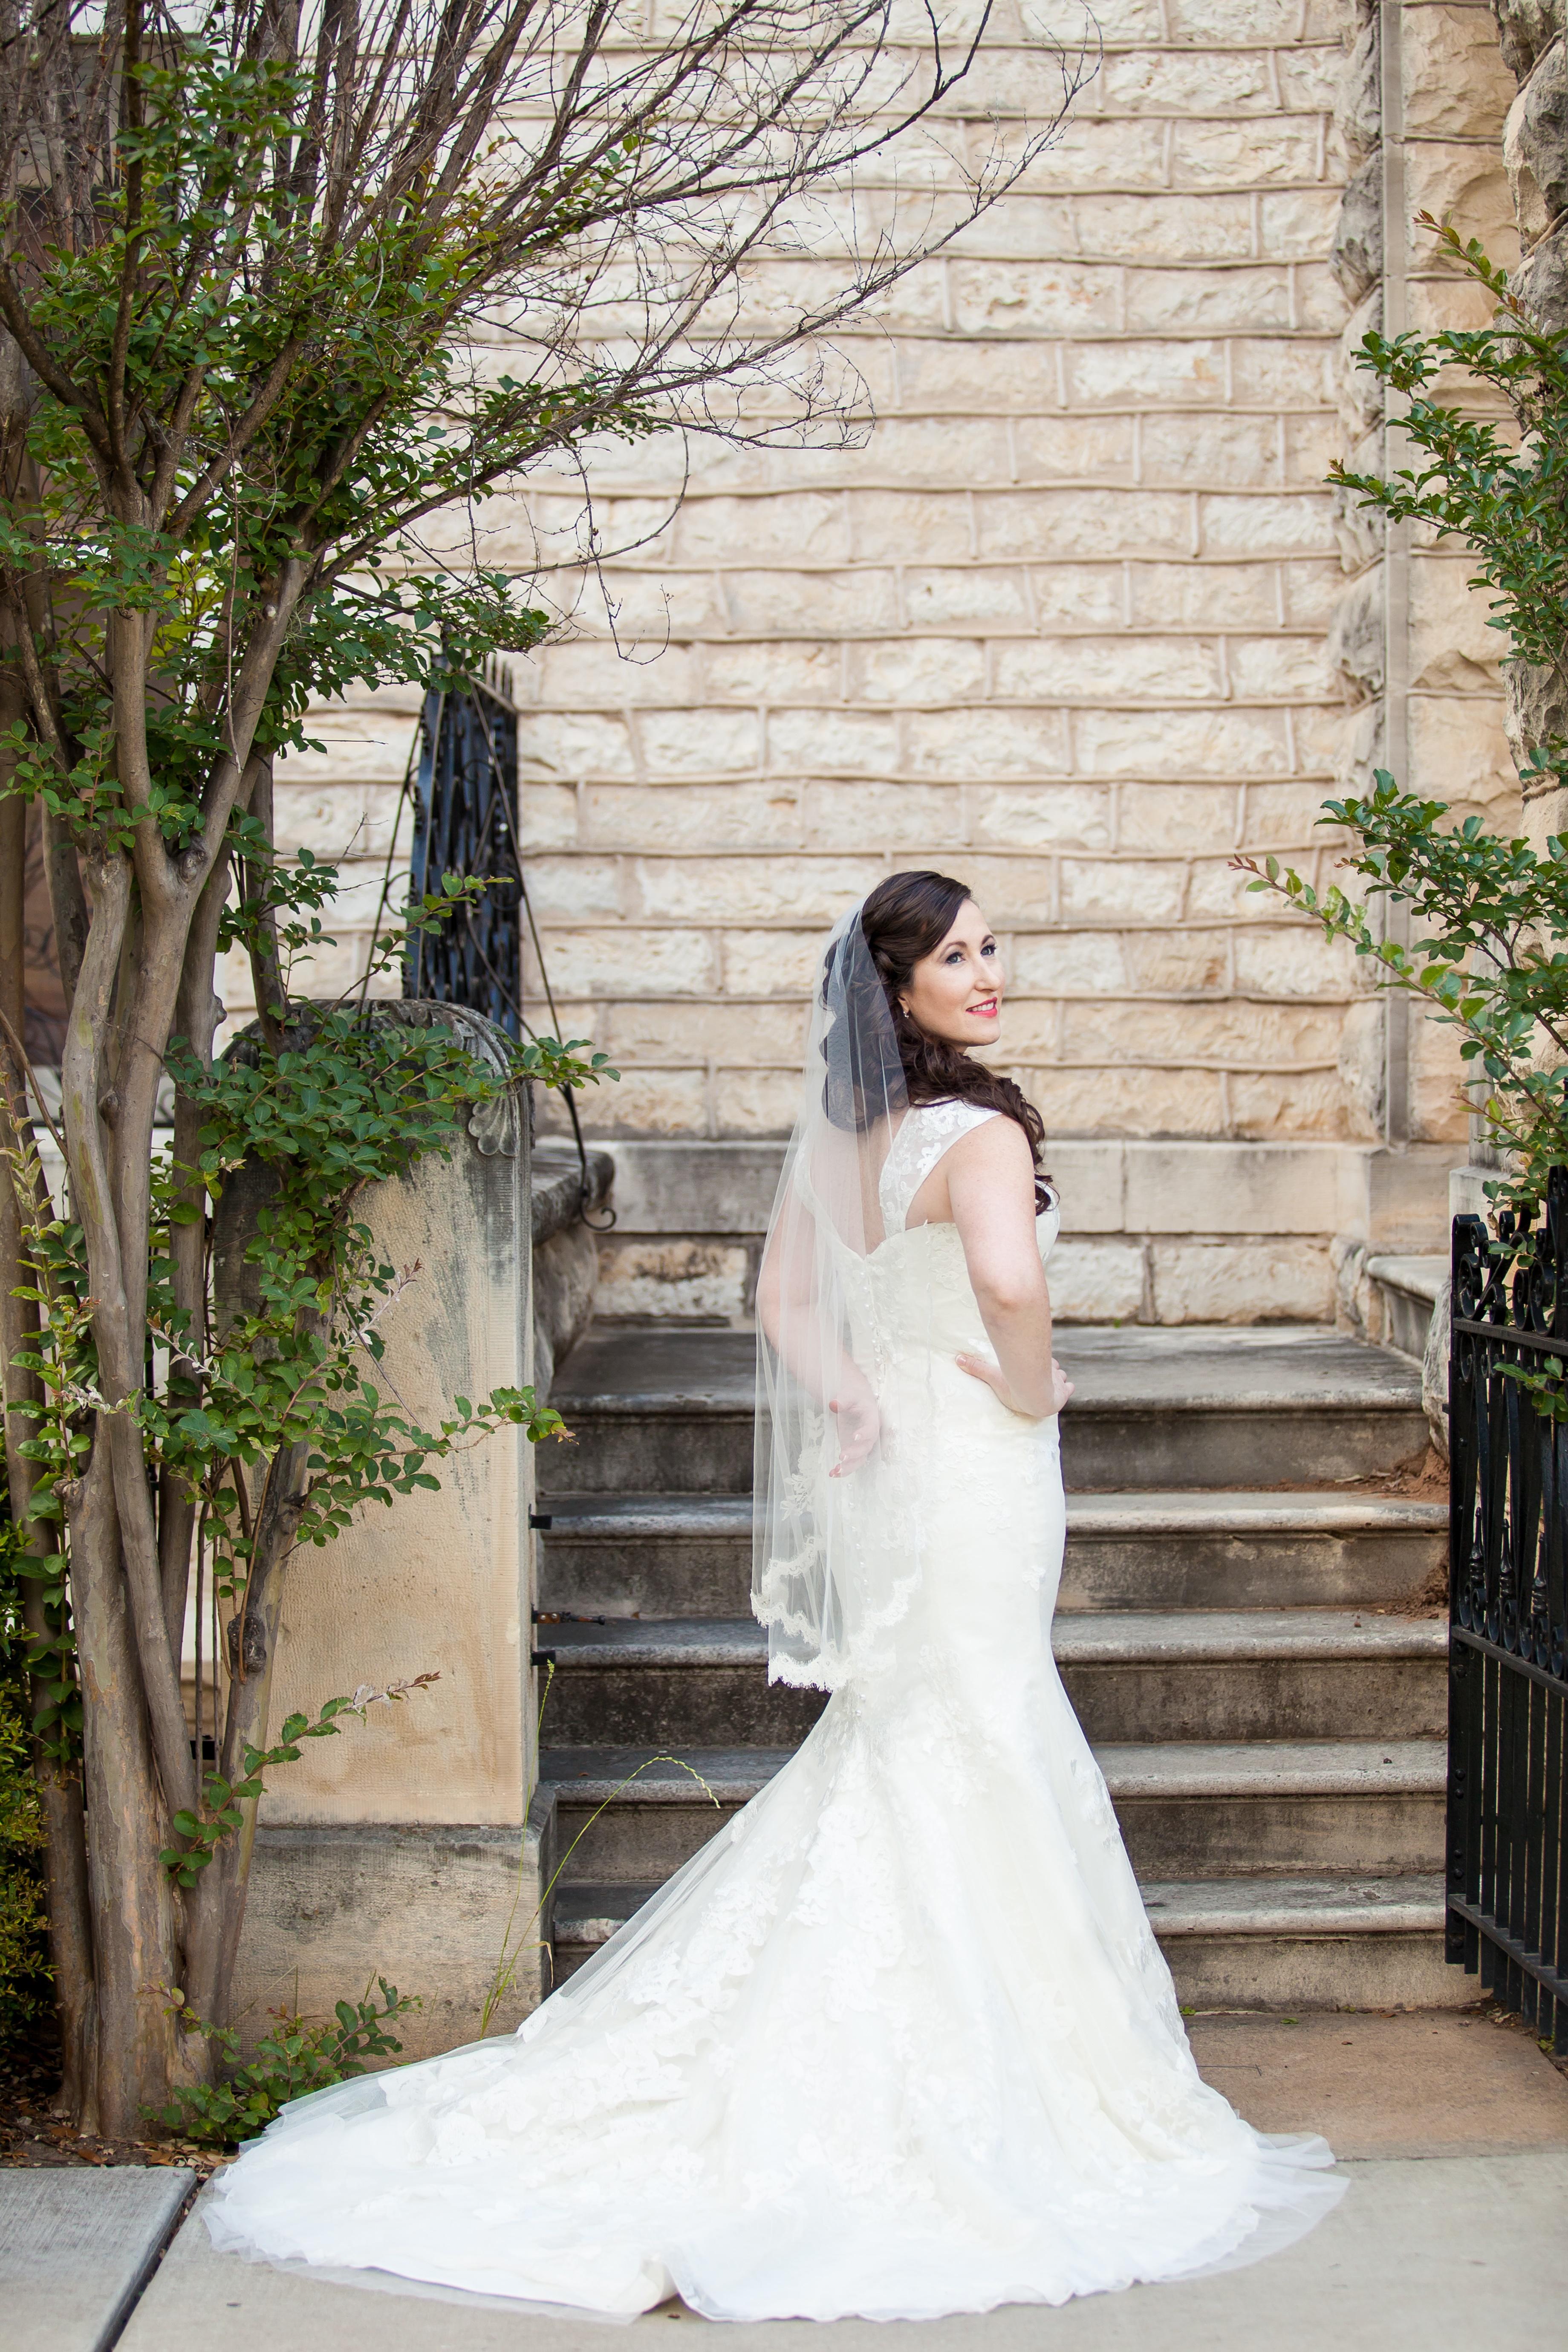 Wedding Dress Photo Bella Mera Bridal Customer